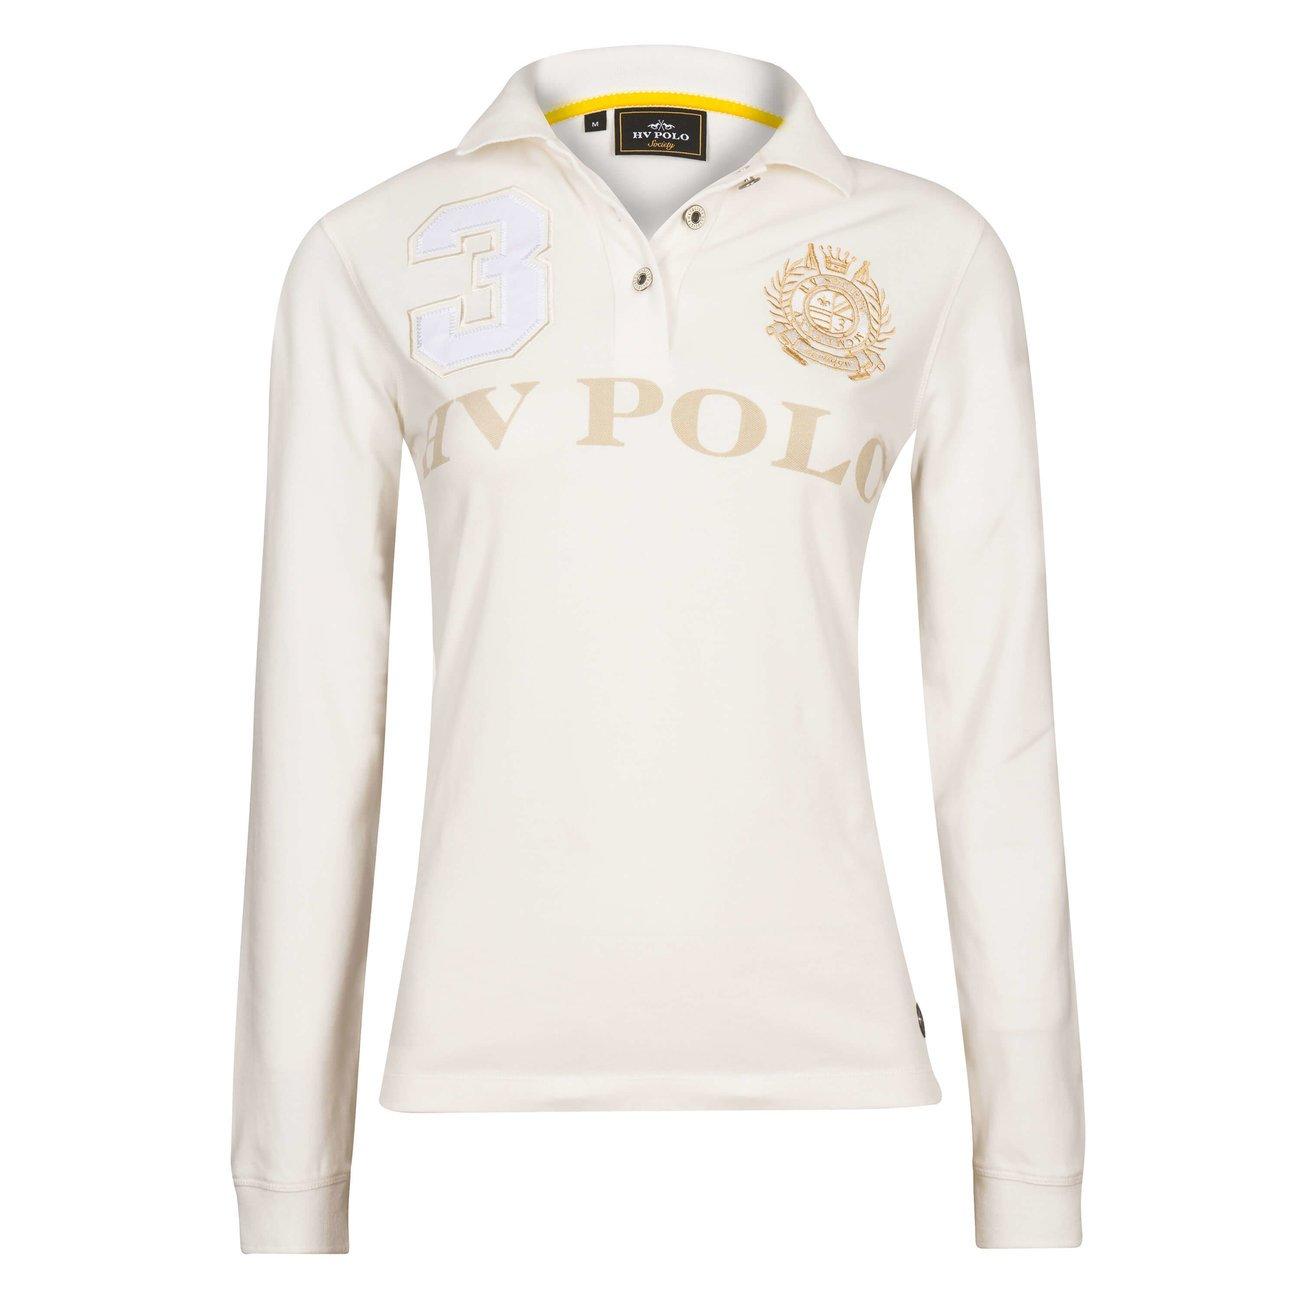 Poloshirt Favouritas Eques lange Ärmel Bild 16